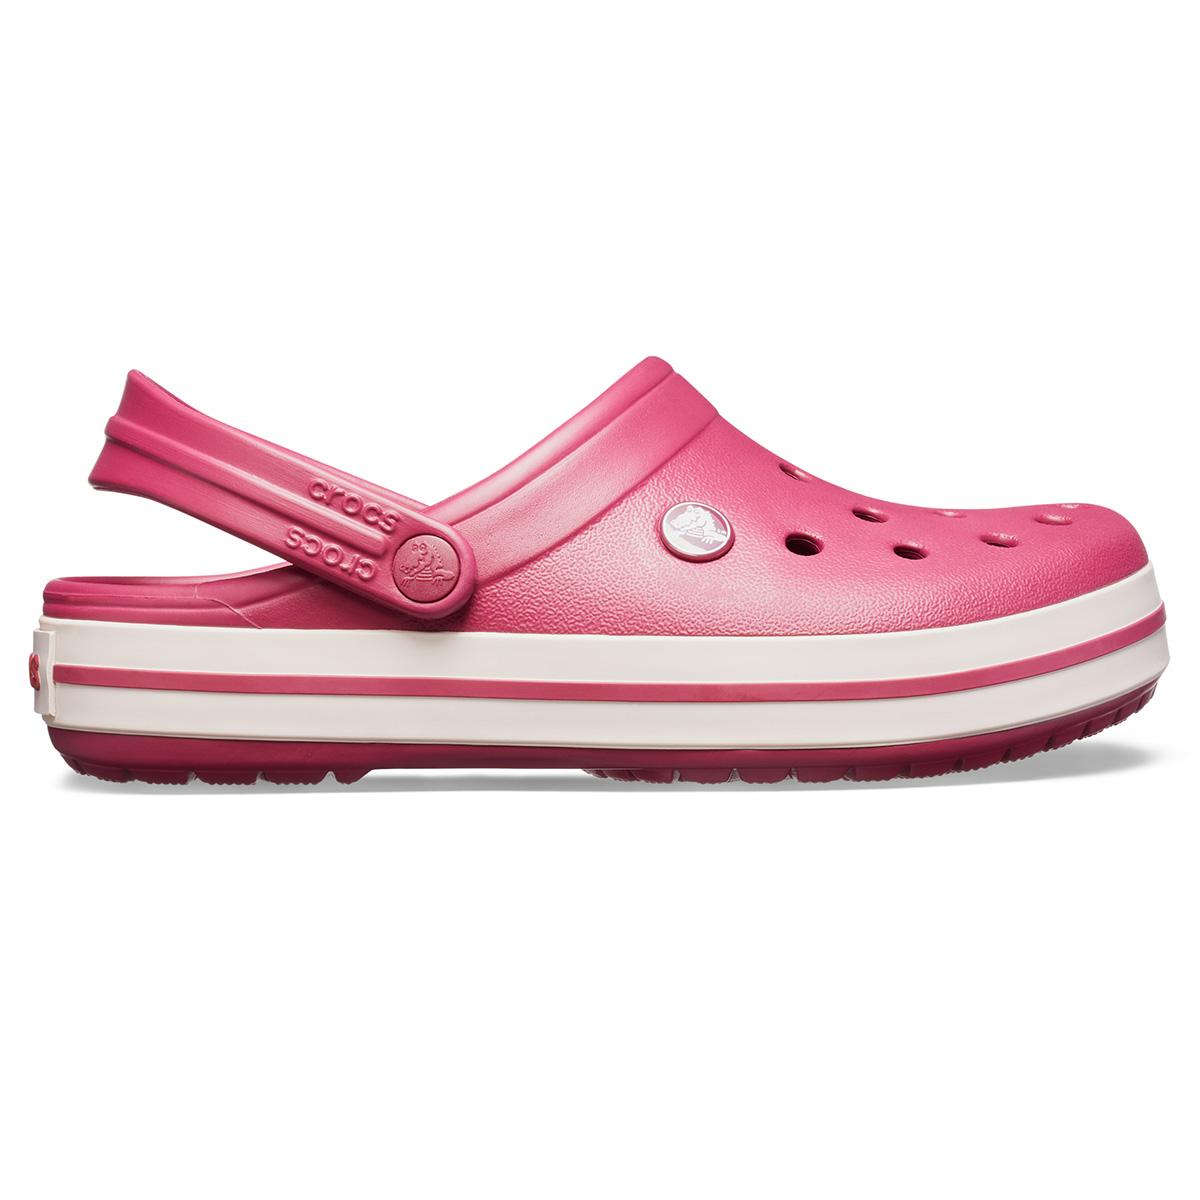 Crocs Crocband - Nar/Gül Tozu